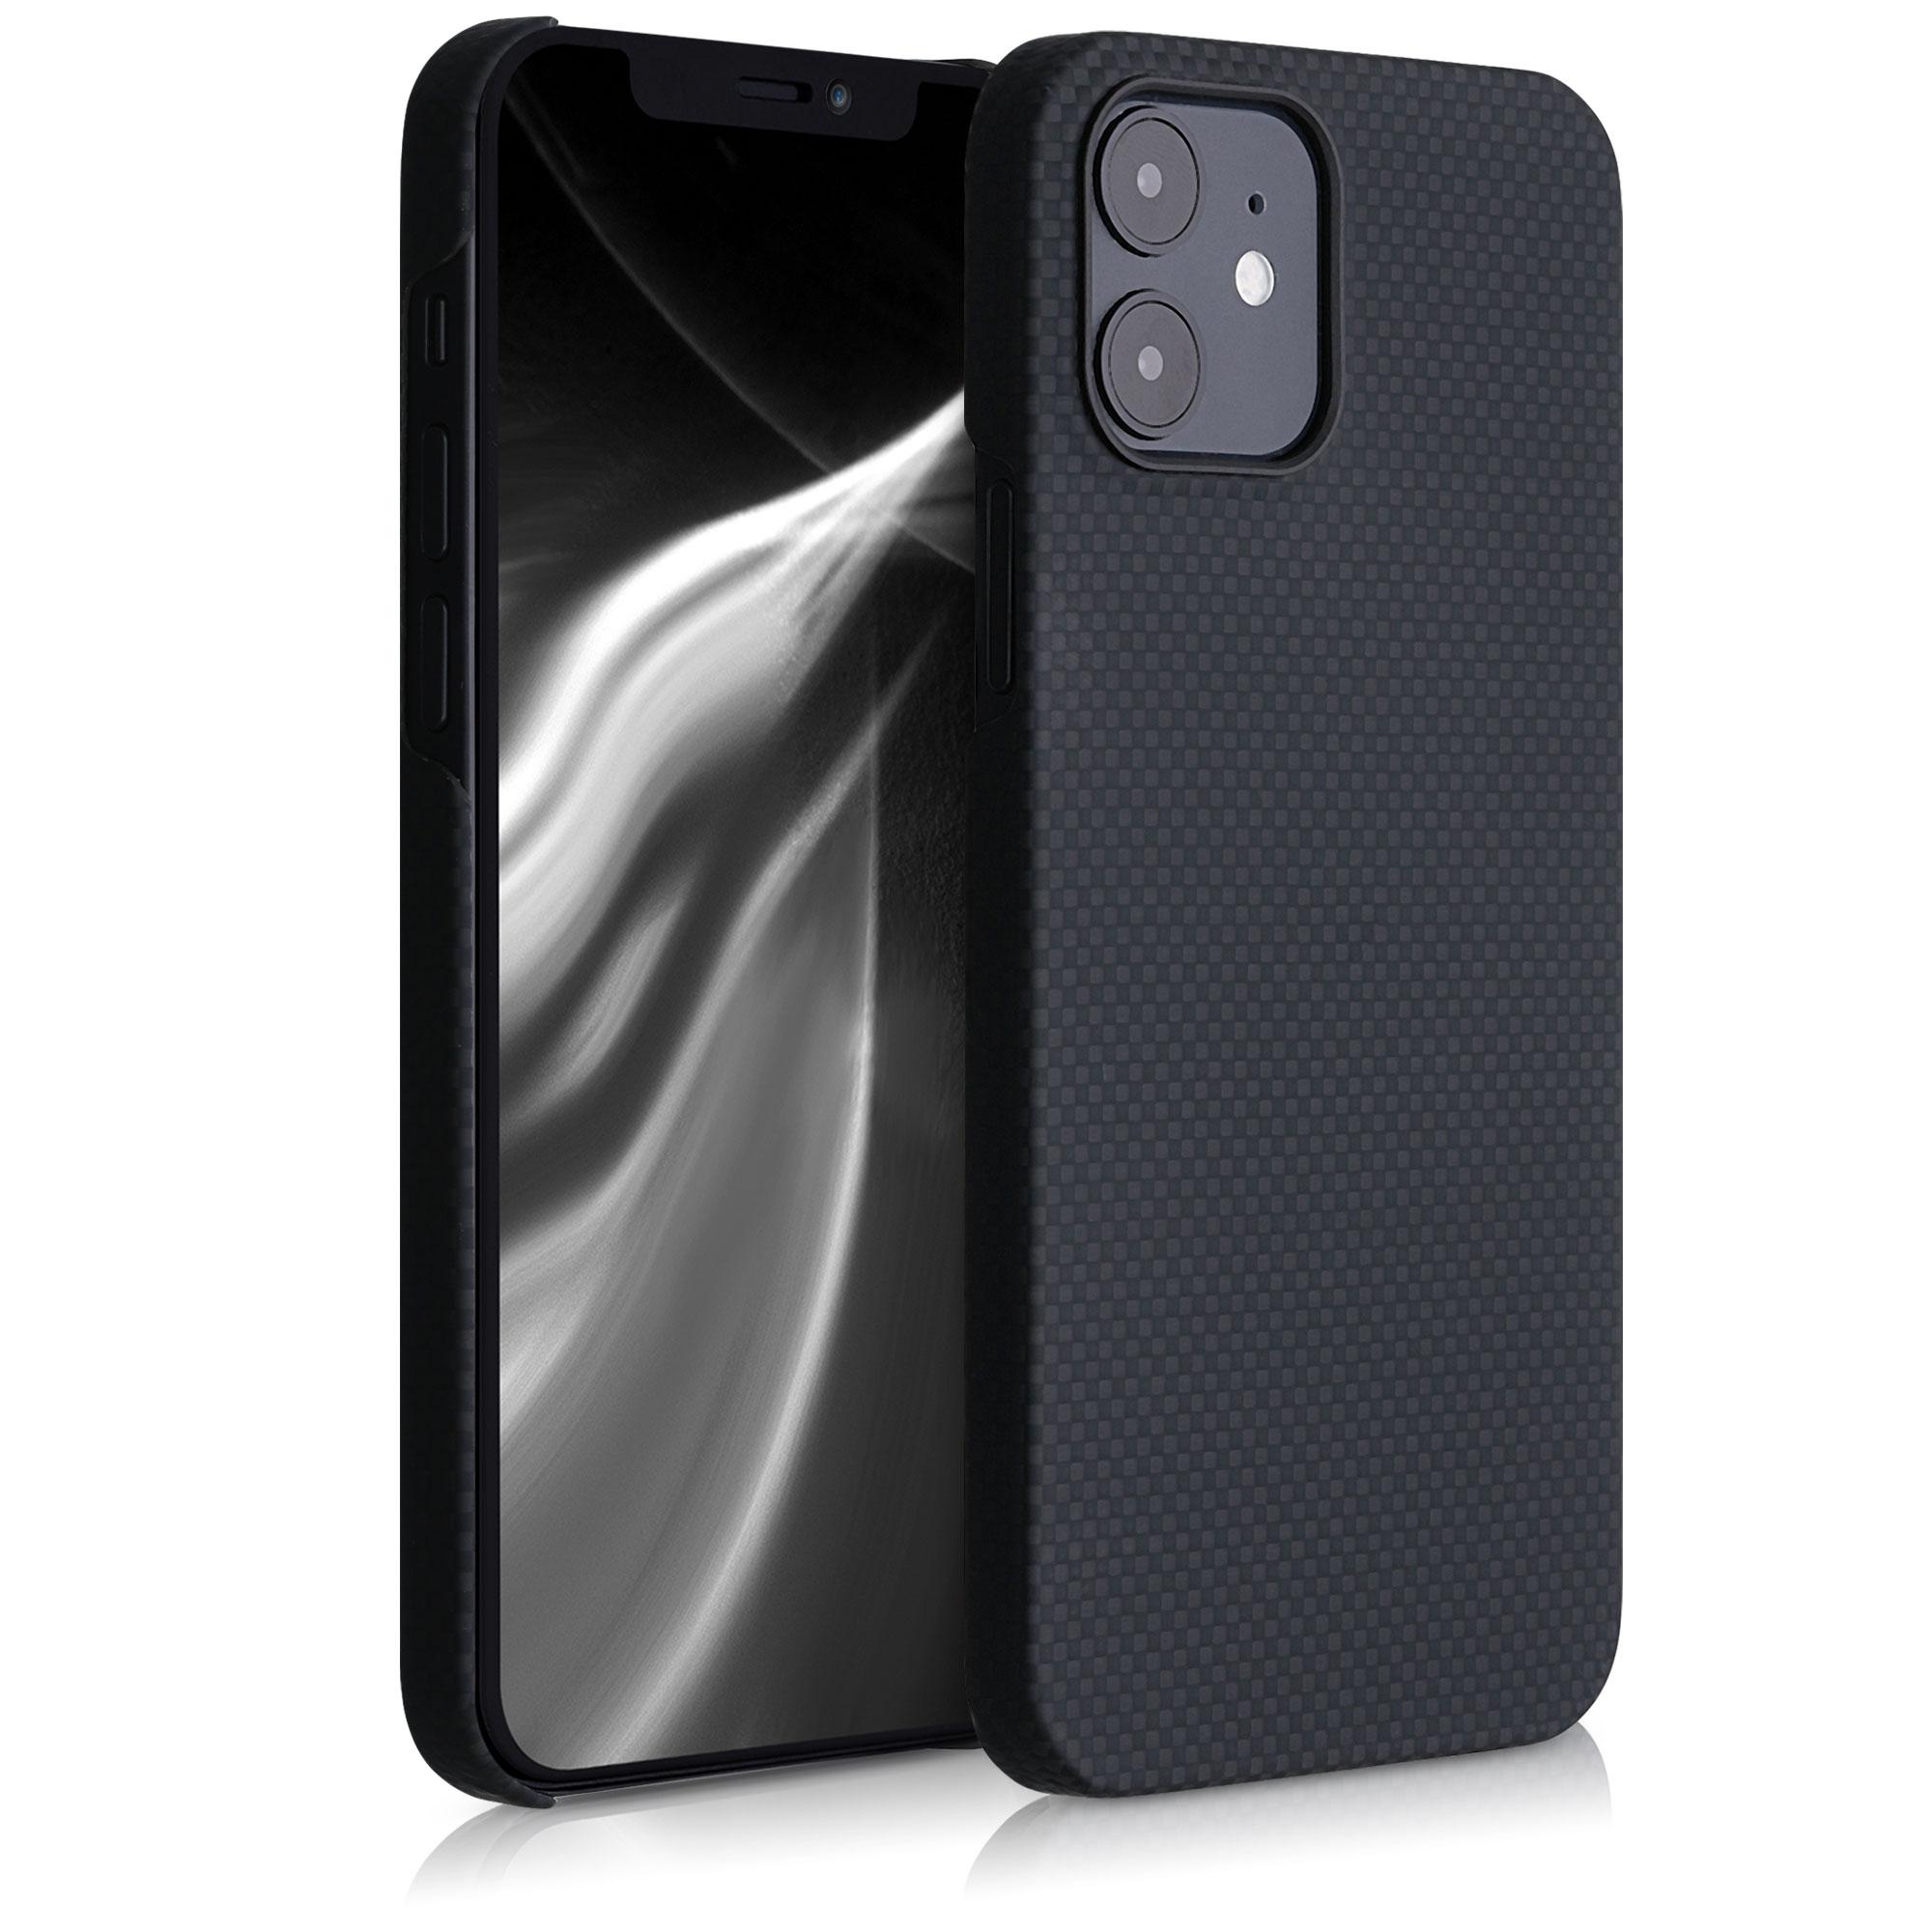 Aramidpouzdro pro Apple iPhone 12 - Černá